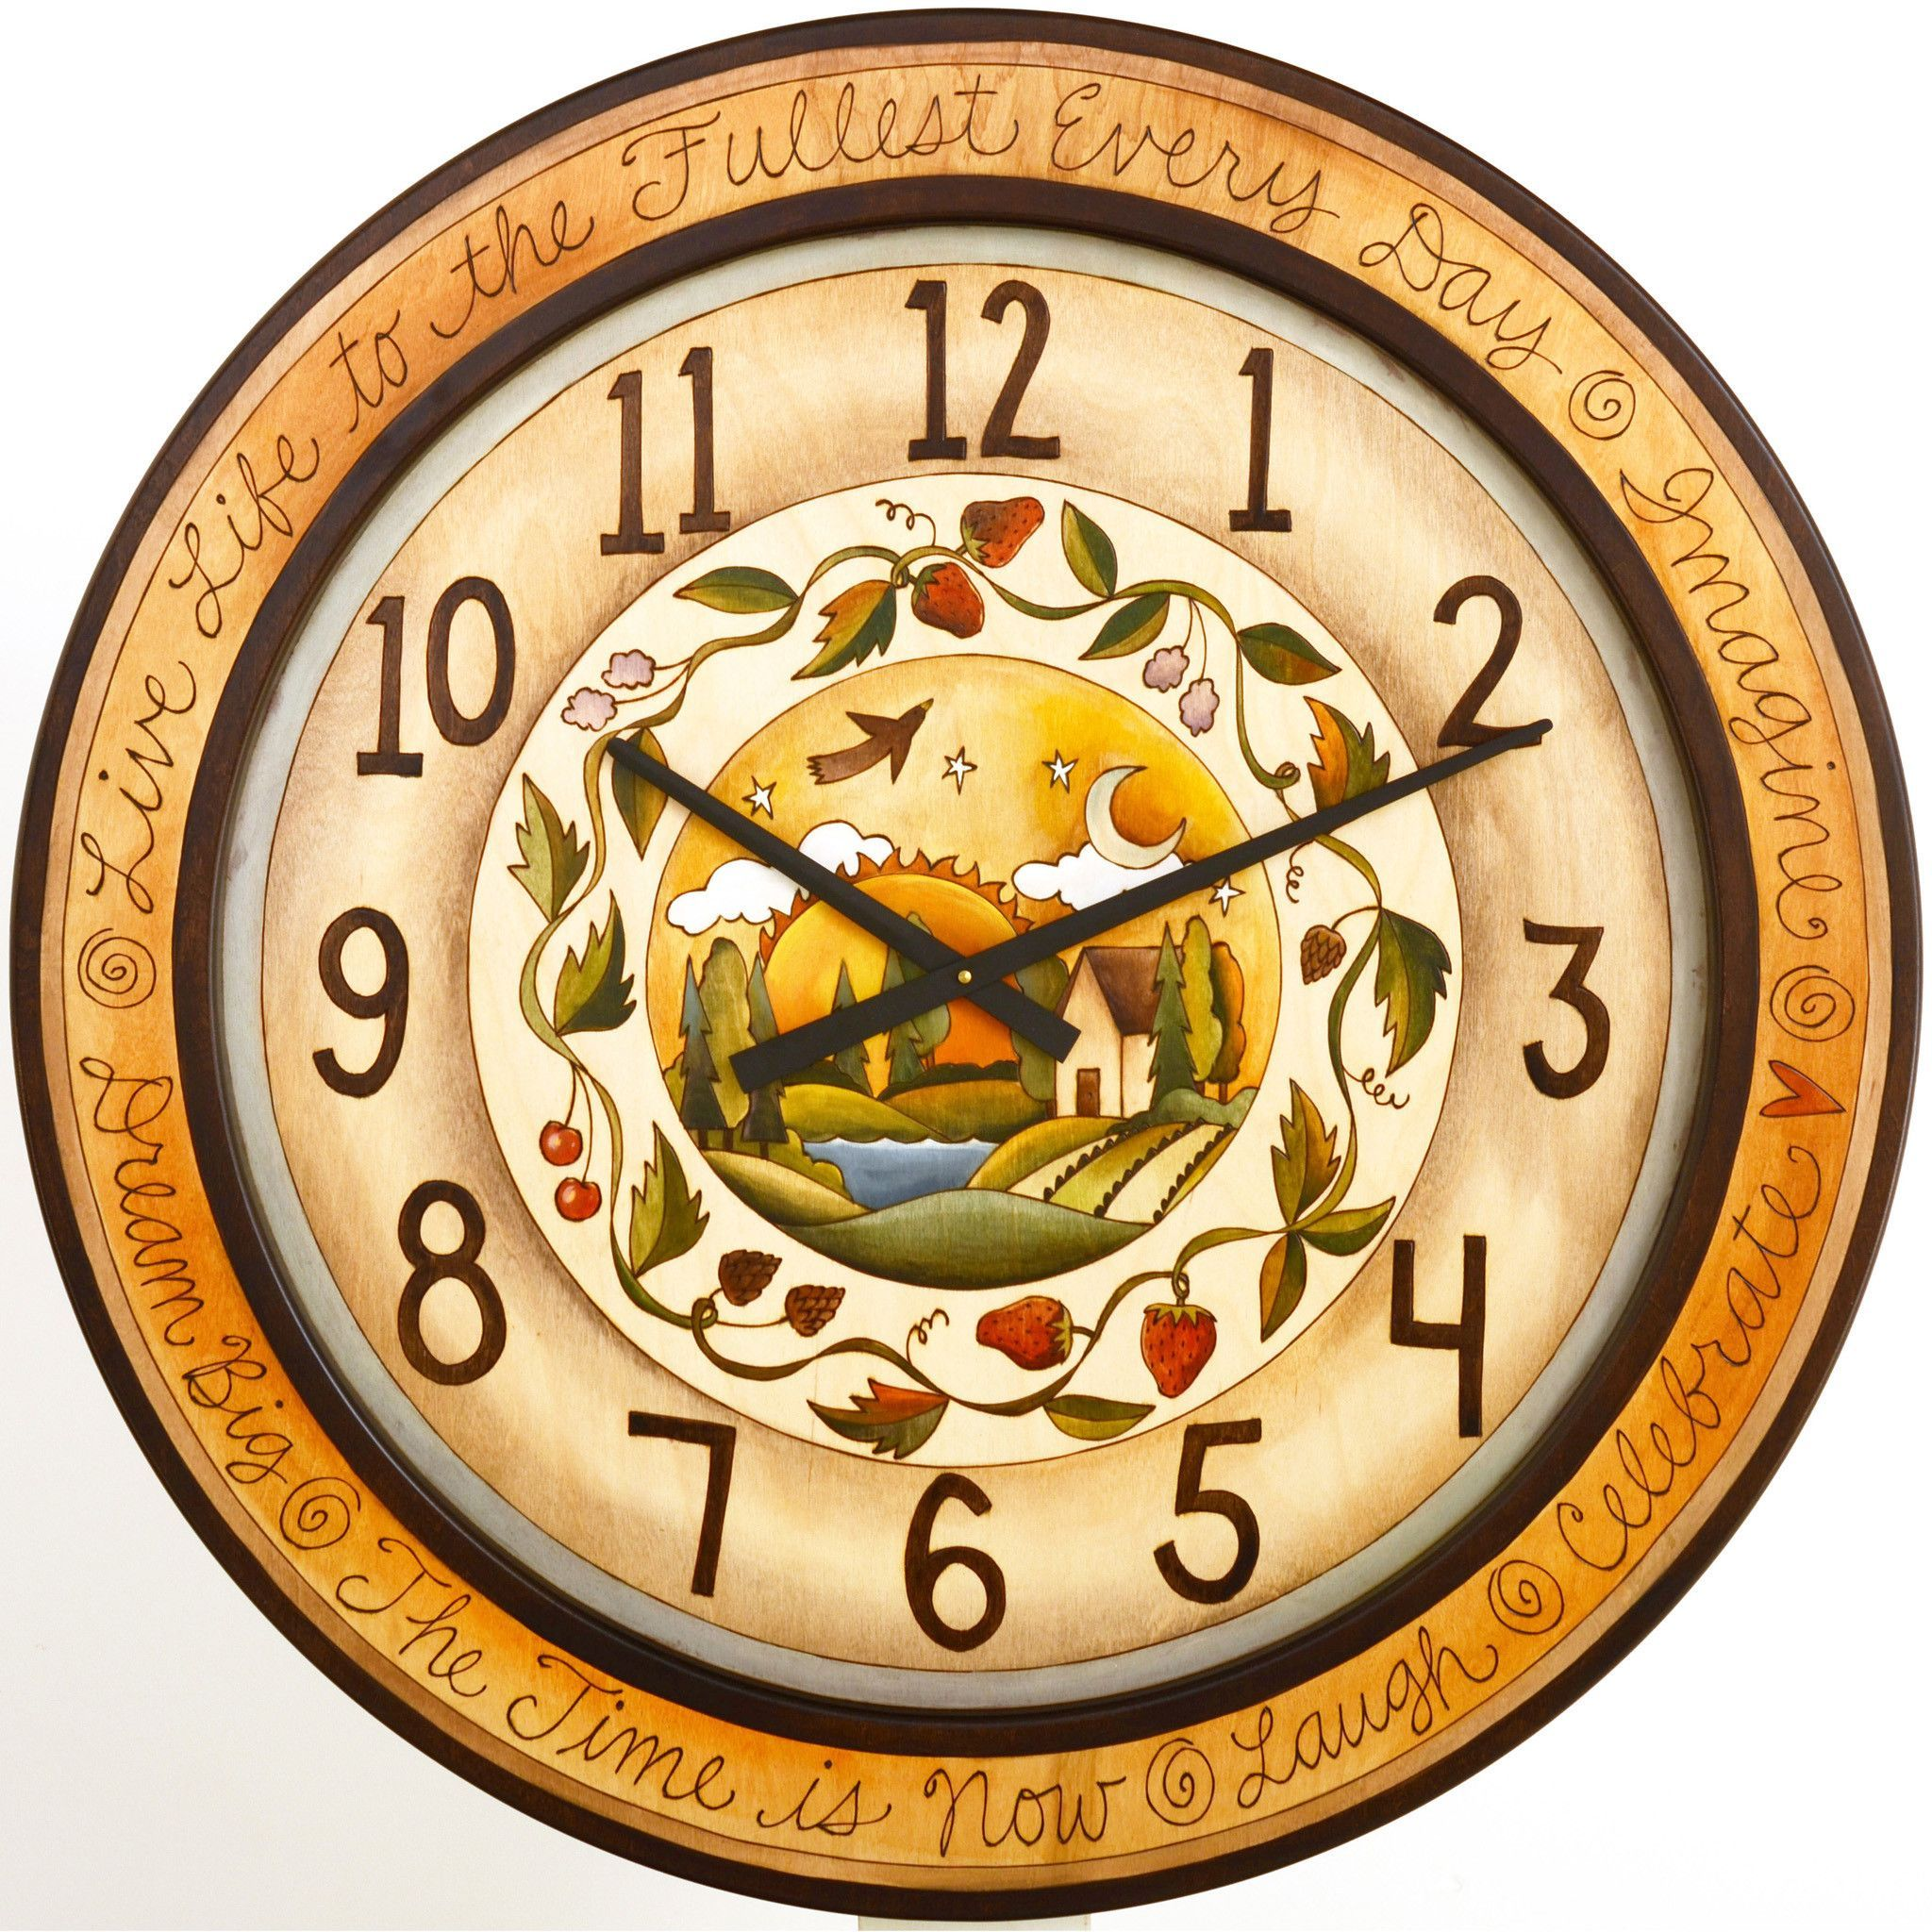 Round Wall Clock by Sticks CLK007, CLK014, CLK015, D71292 | Clocks ...